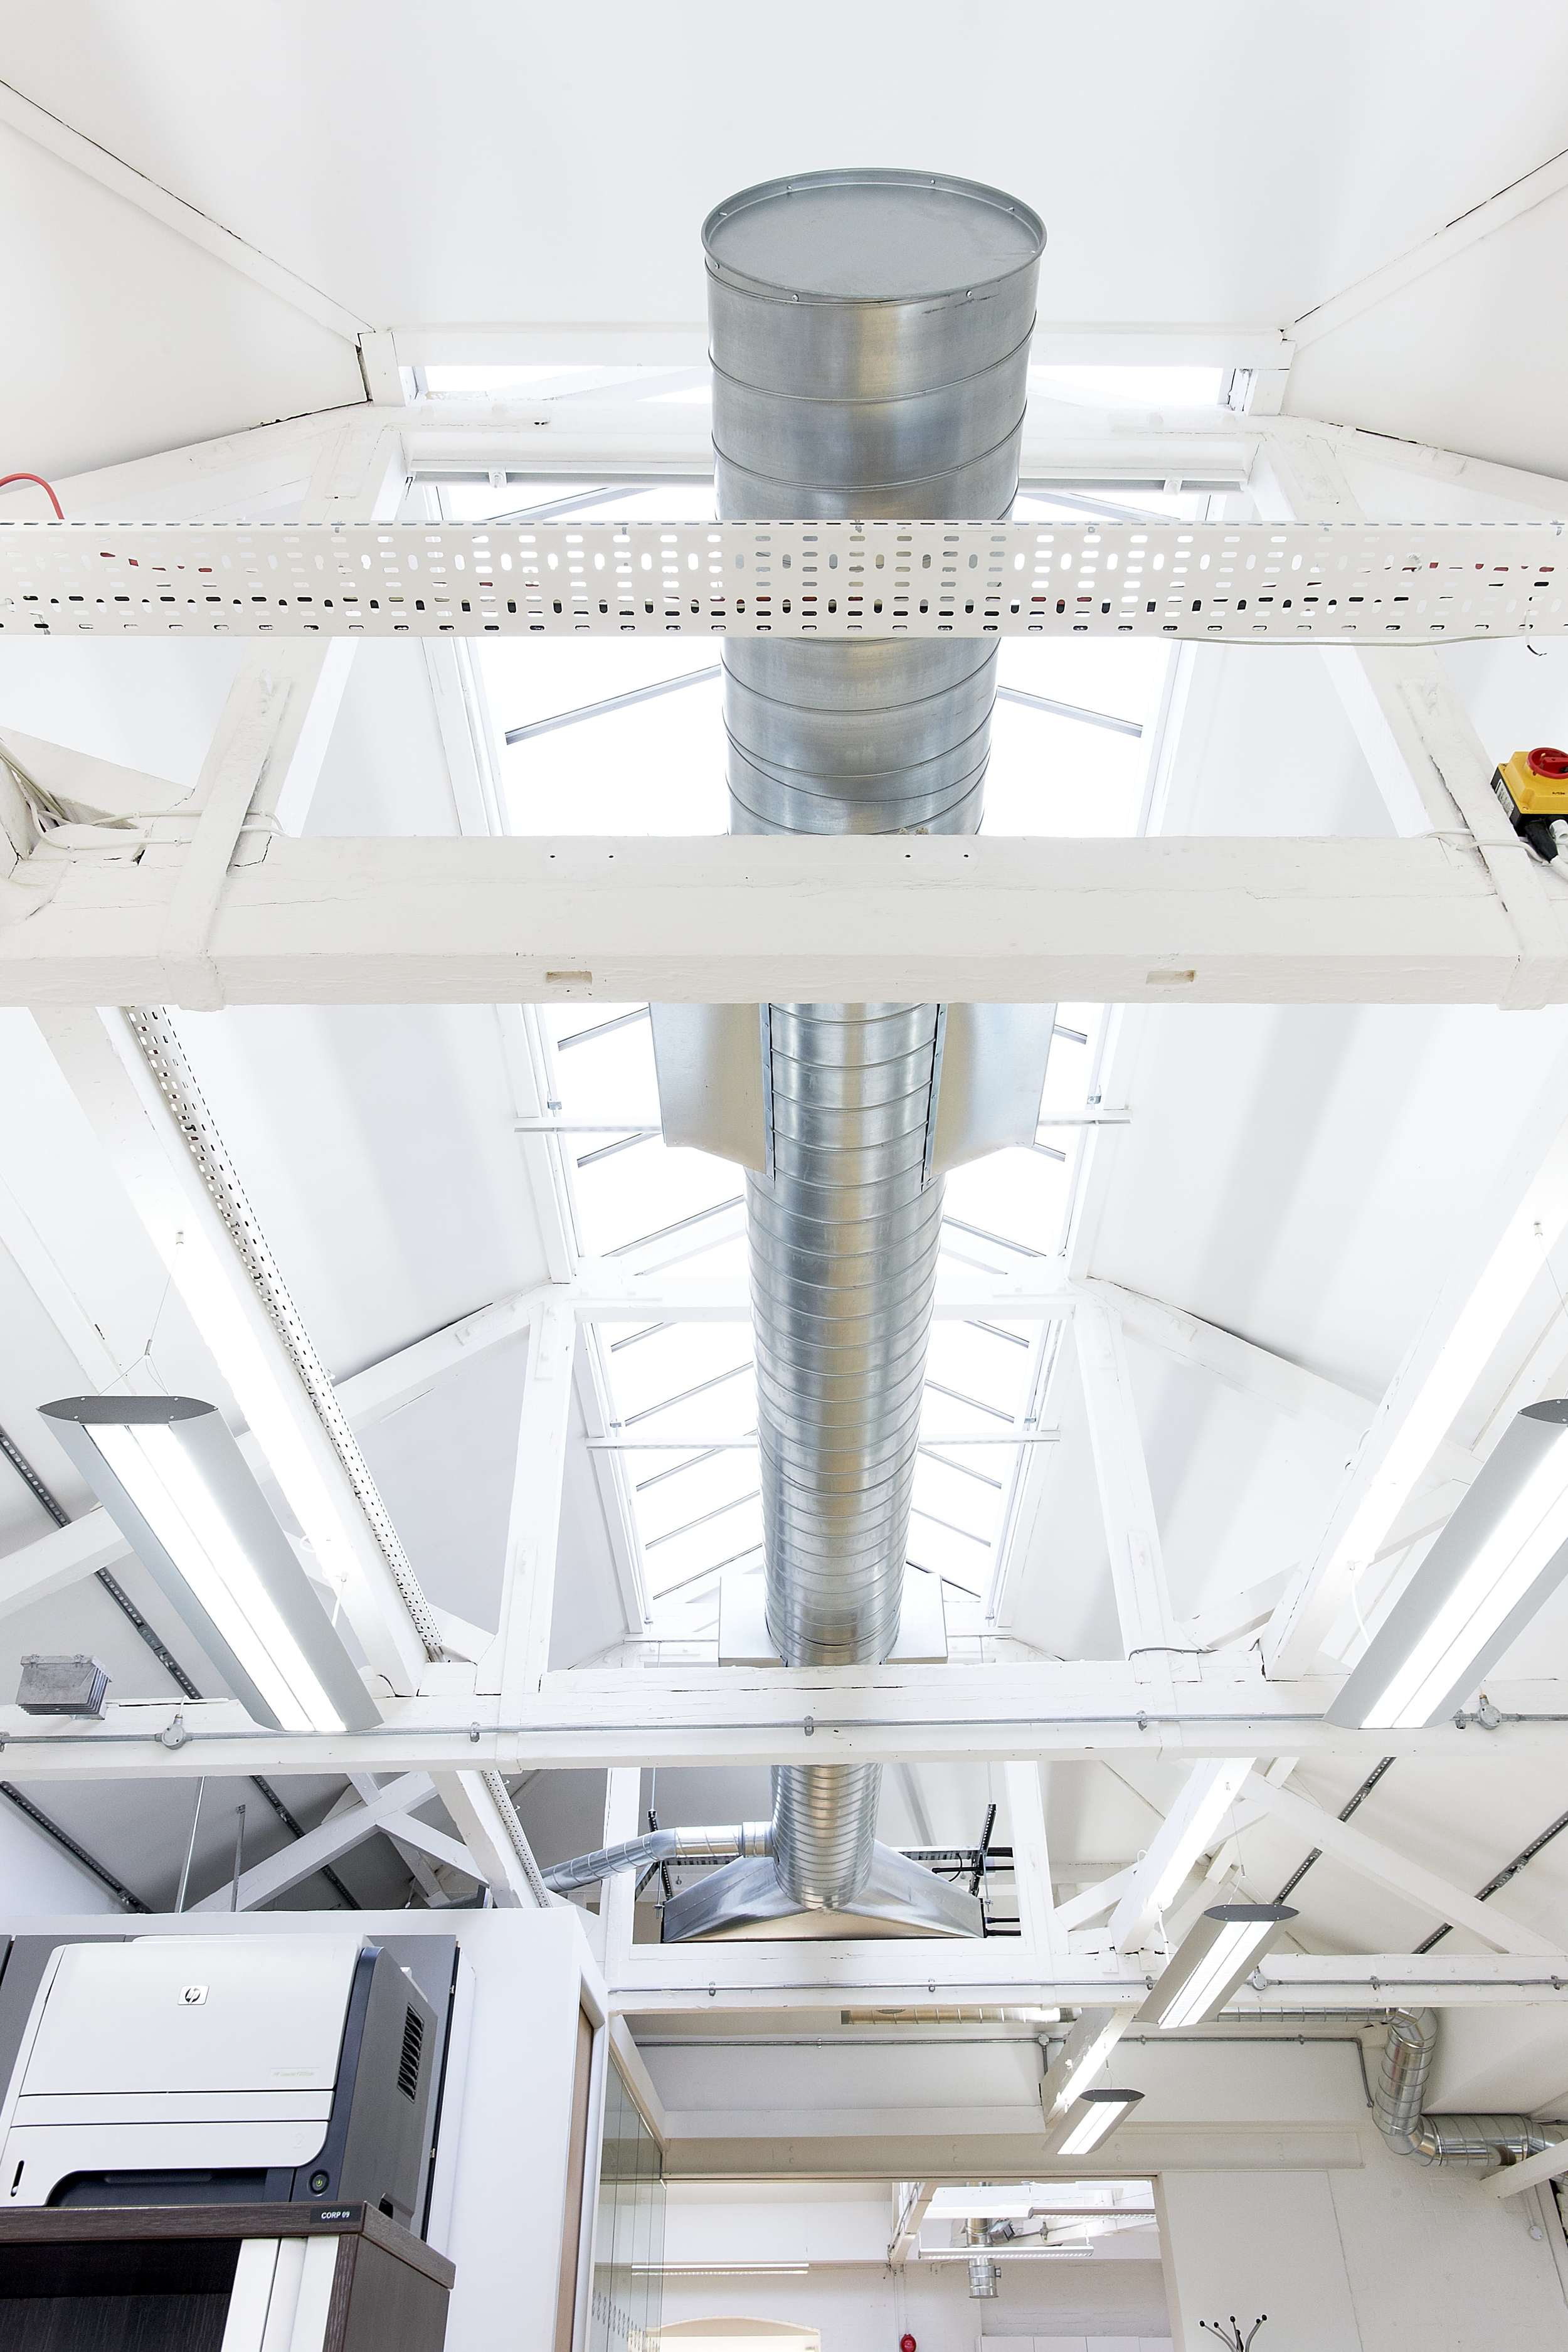 Cineflix-361-Degrees-Air-Conditioning-Case-Study-03.jpg